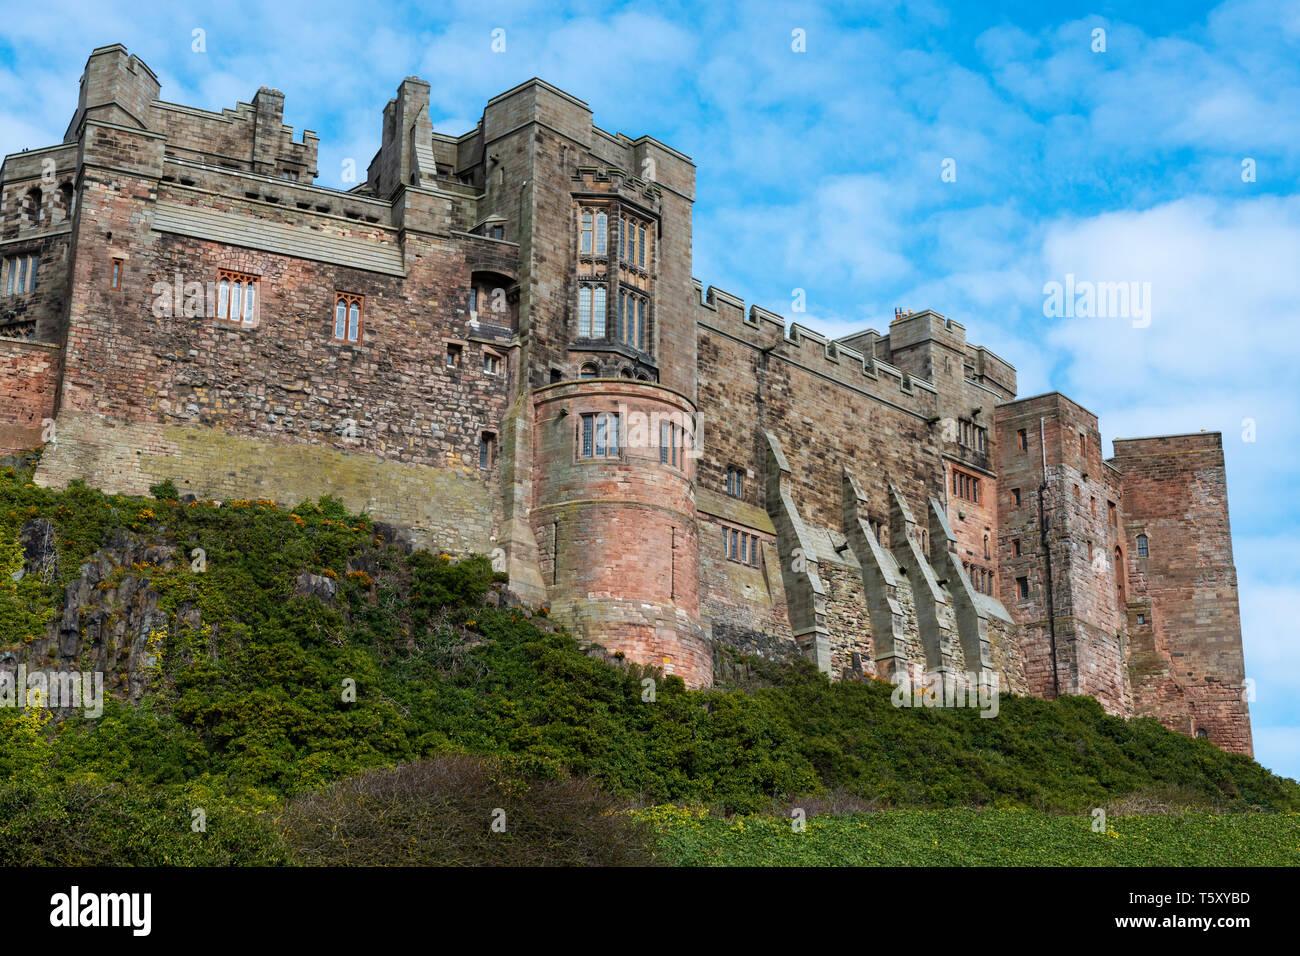 External view of Bamburgh Castle from Bamburgh Village, Northumberland, England, UK Stock Photo